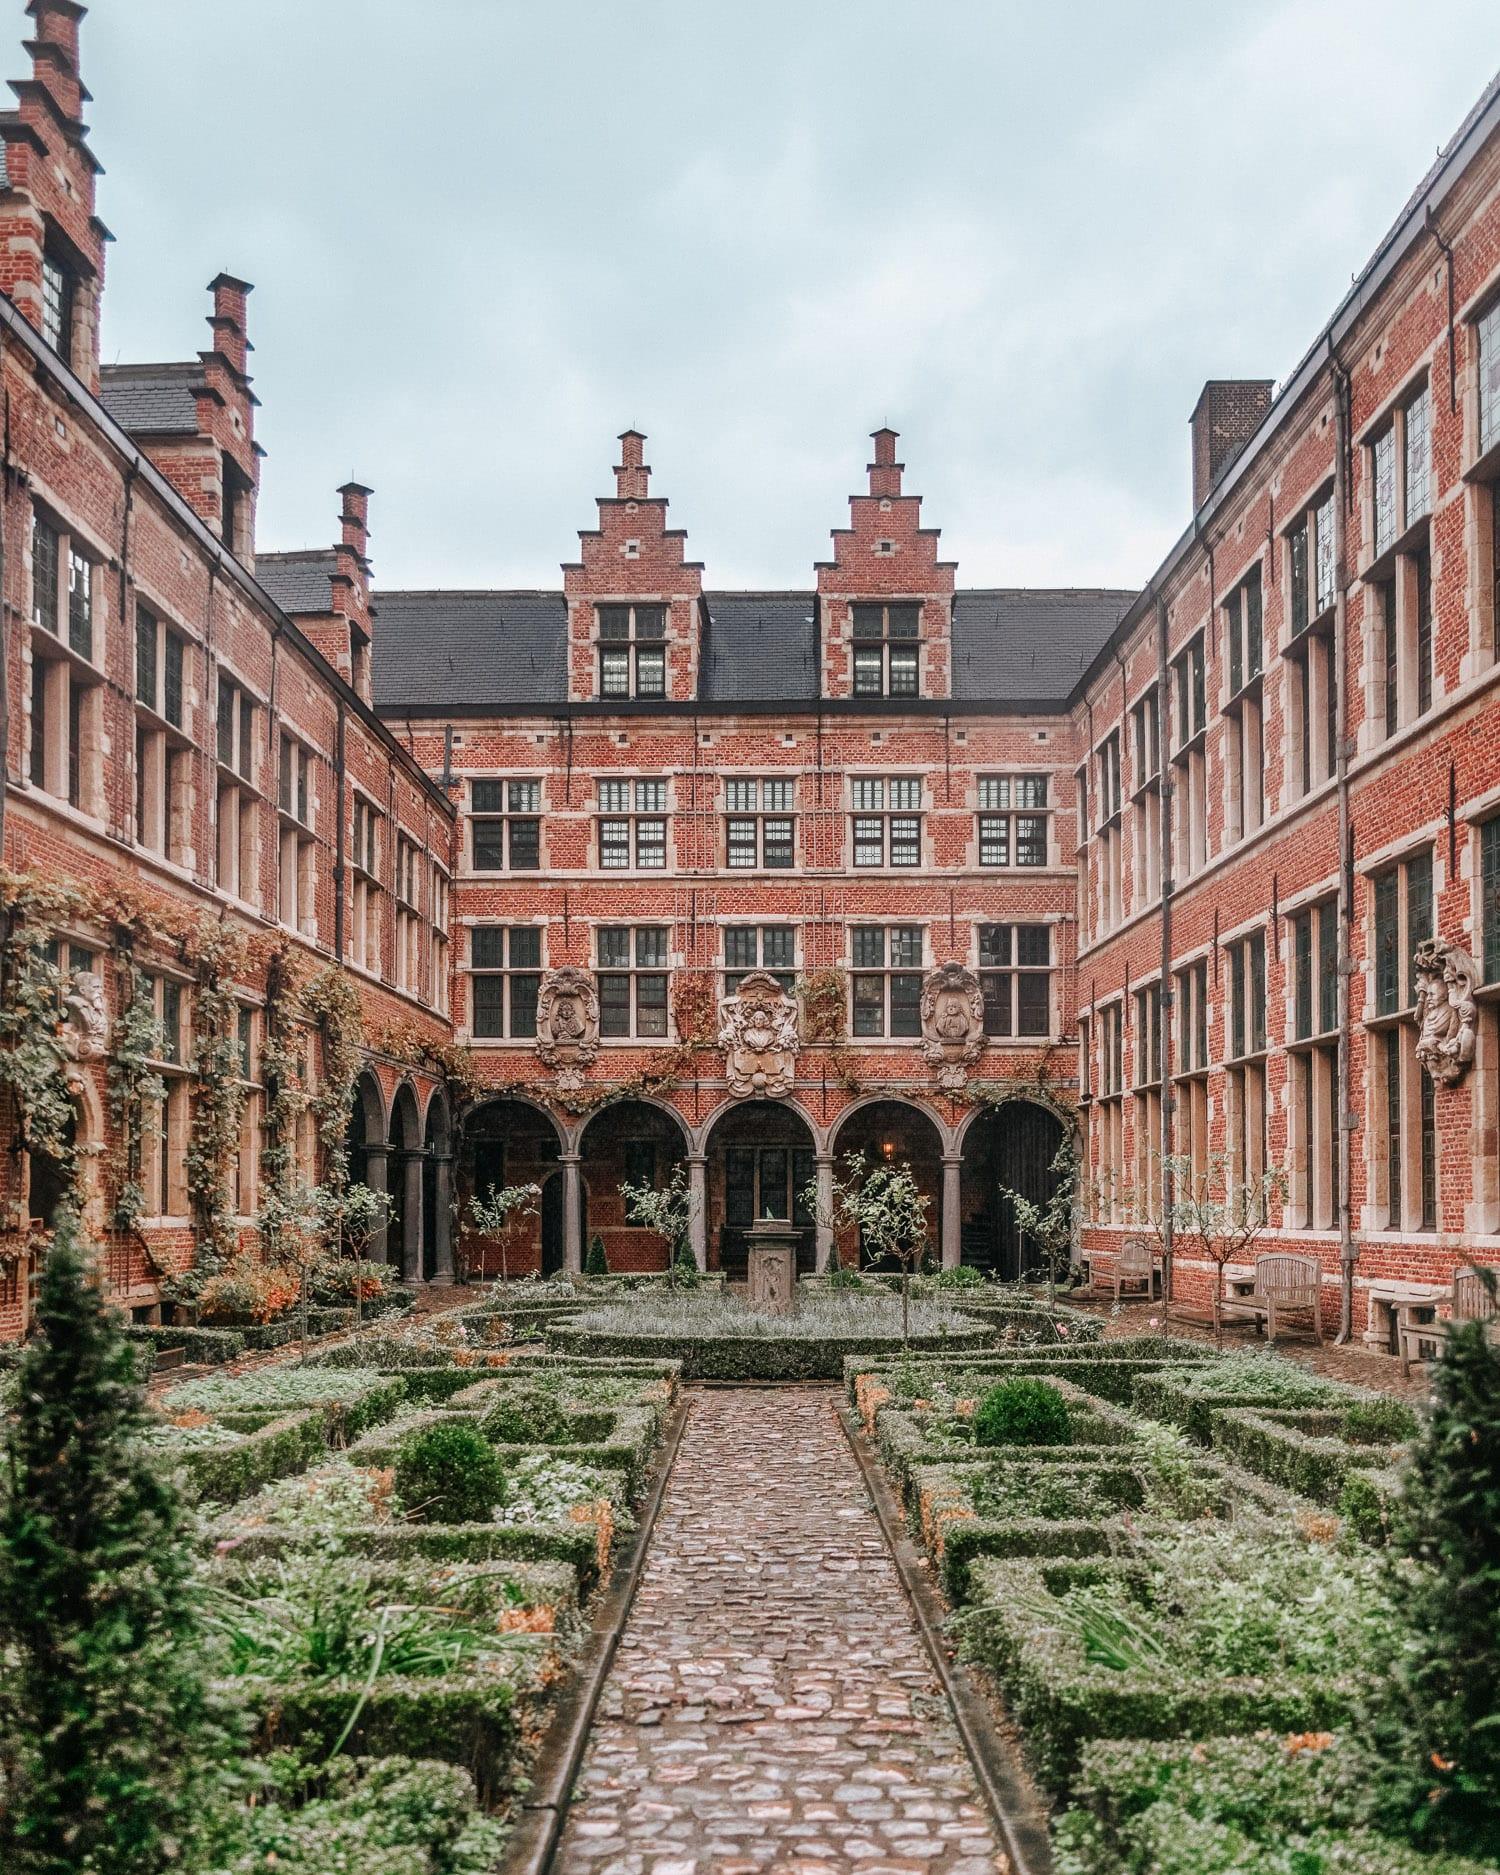 Plantin-Moretus Museum i Antwerpen, Belgien